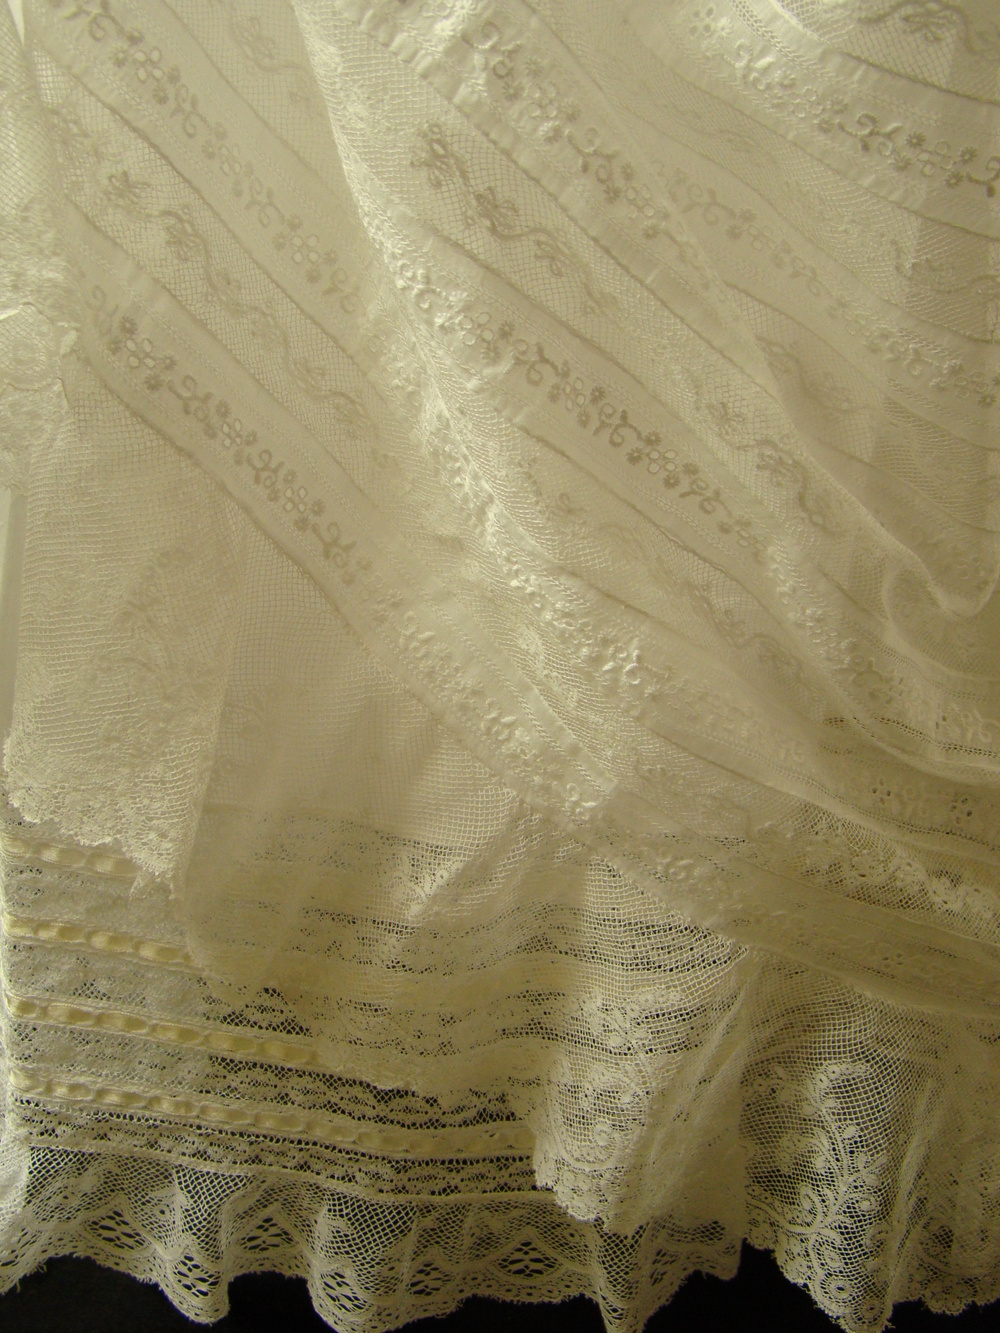 gowns3 058.JPG